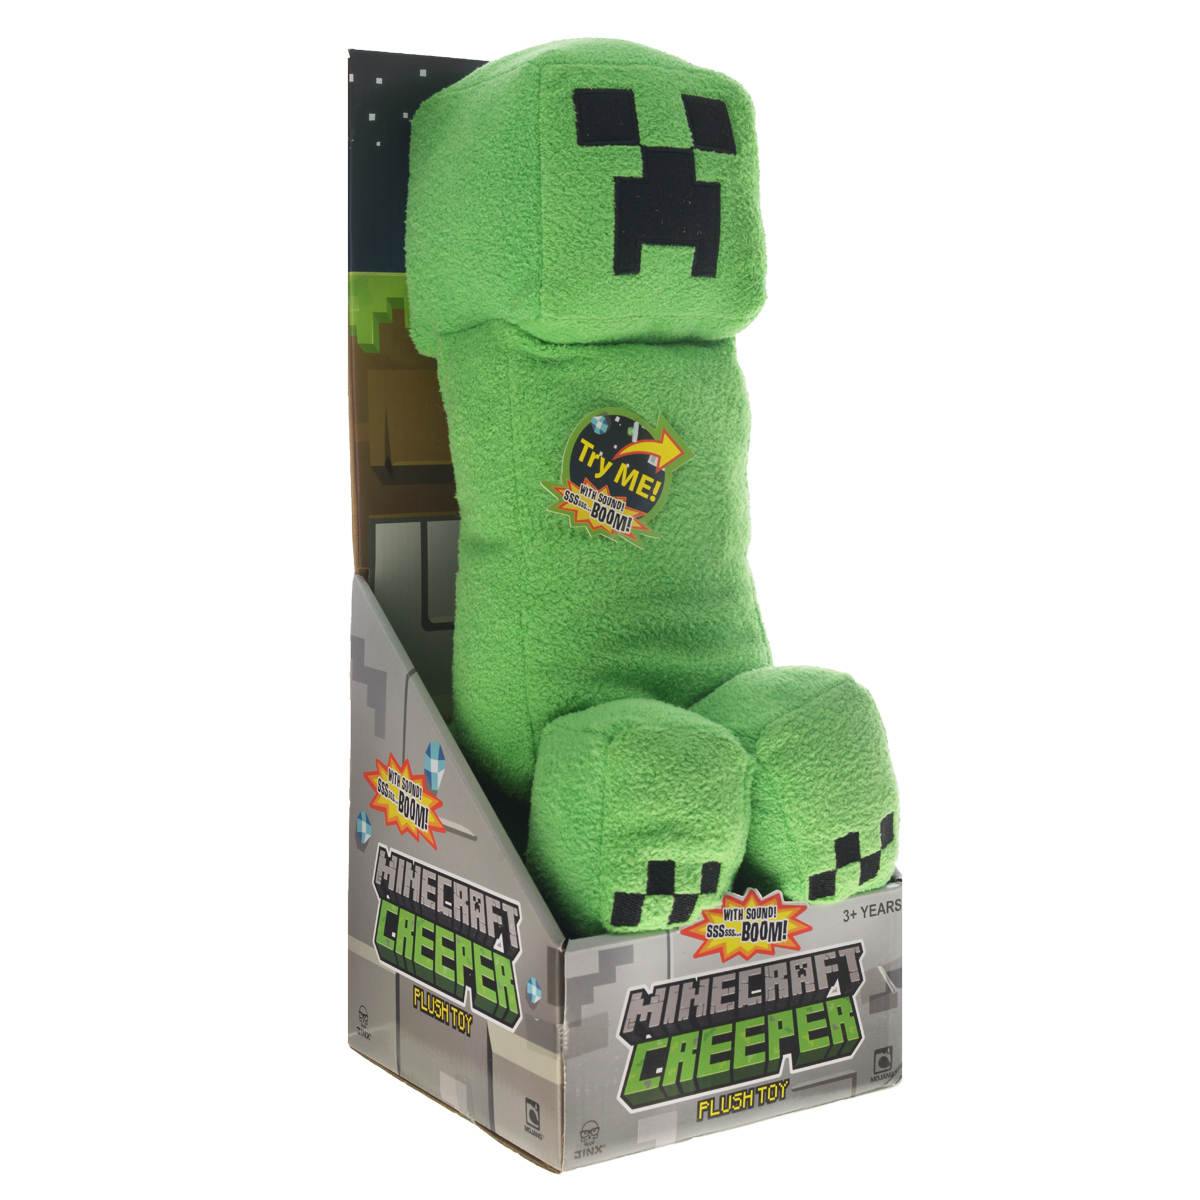 интернет магазин майнкрафт игрушки дешево души вам